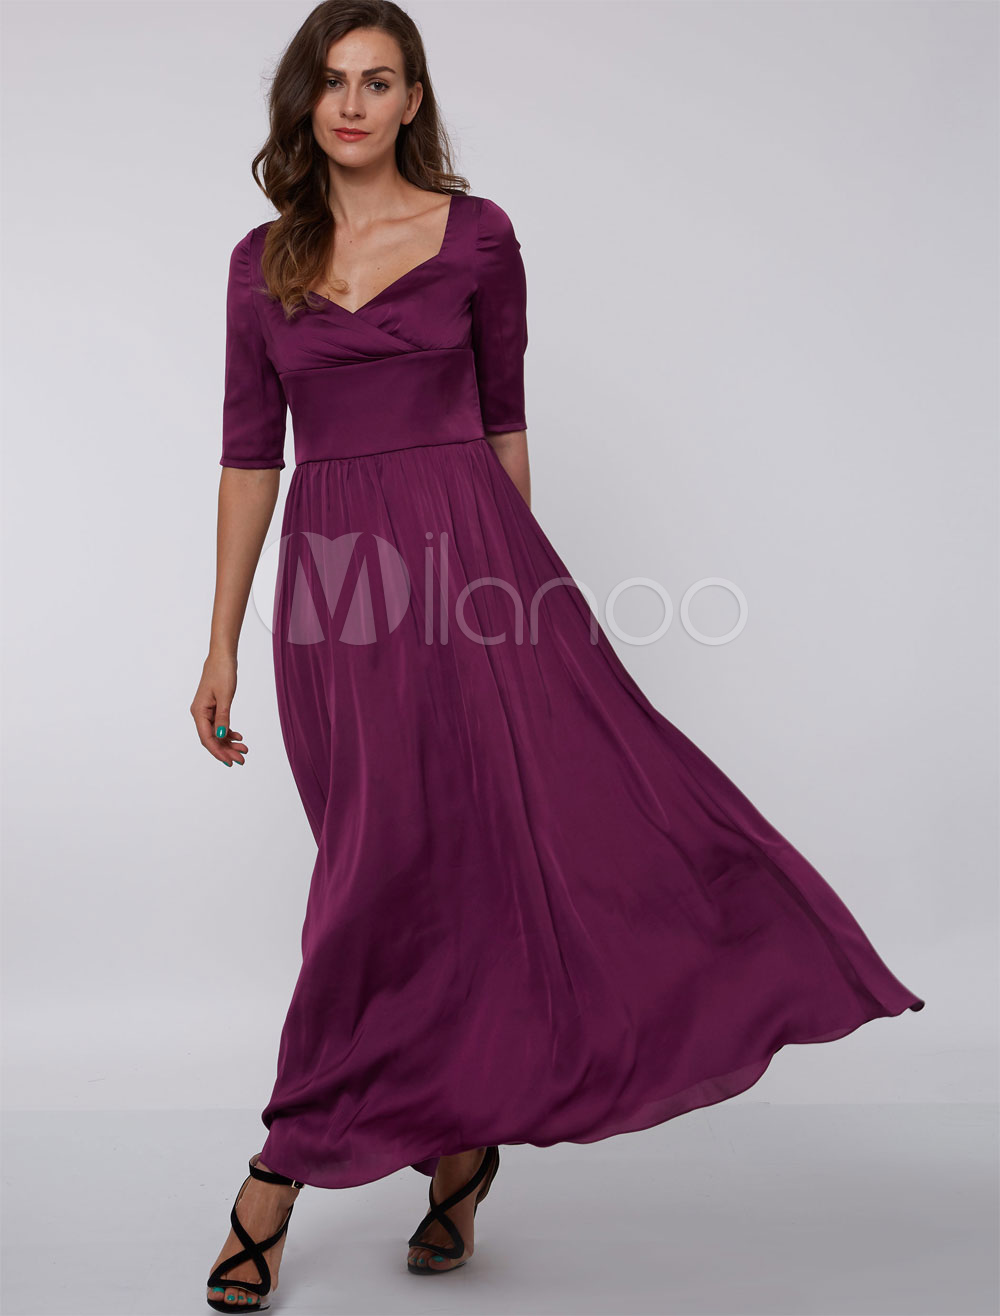 Evening Dresses Formal Plum Queen Anne Neck Mother Dress Half Sleeve Elastic Silk Like Satin Long Wedding Guest Dresses photo